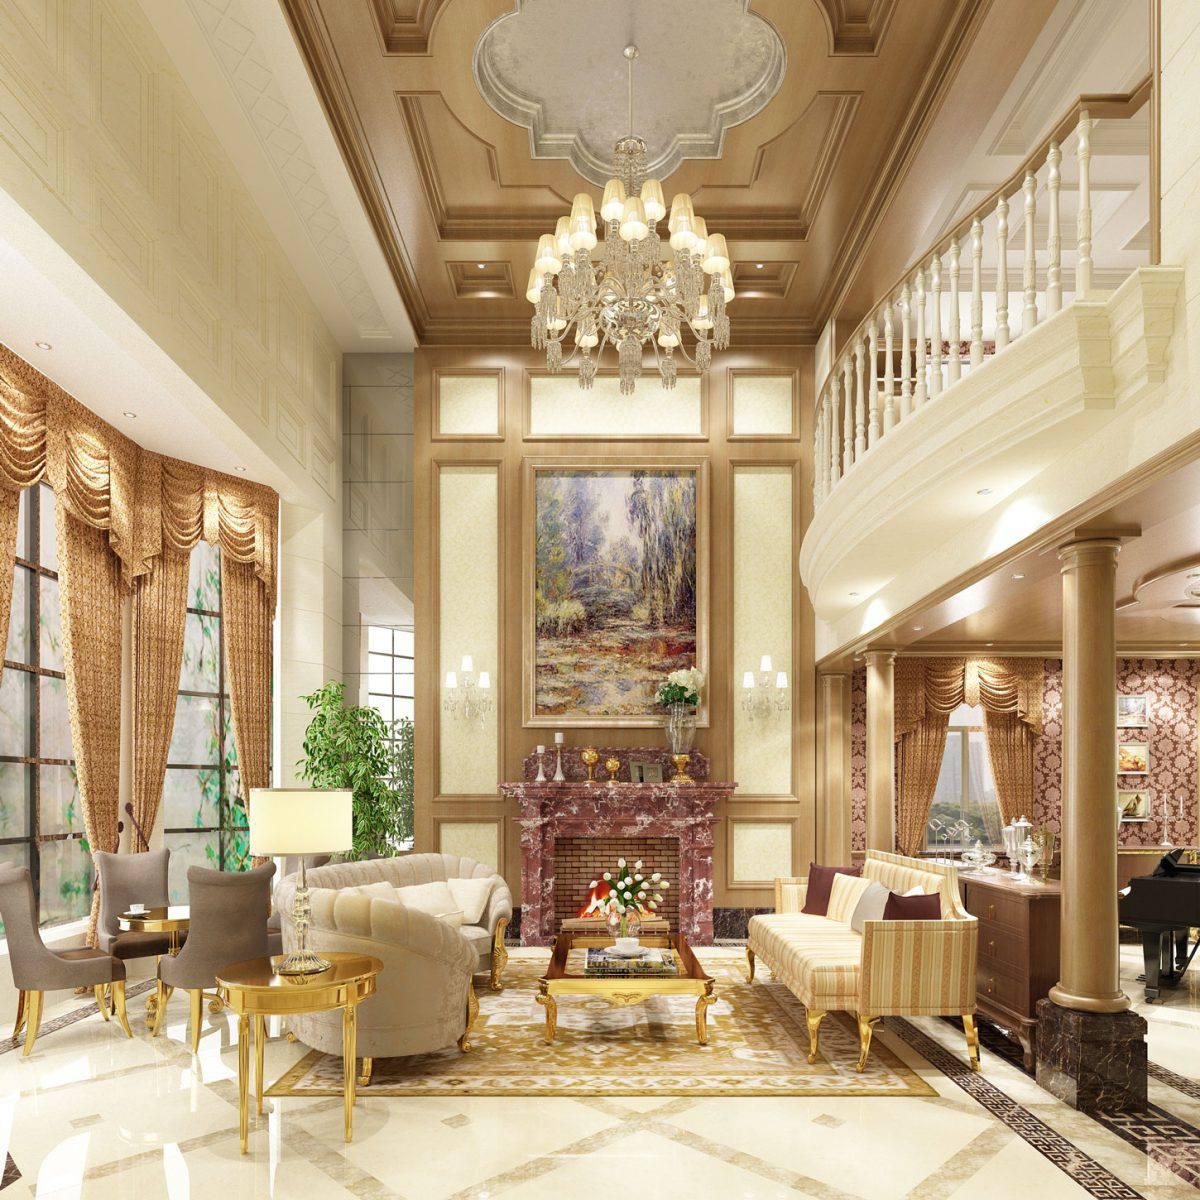 randari-3d-design-interior-profile-ornamentale-05-3dartstudio